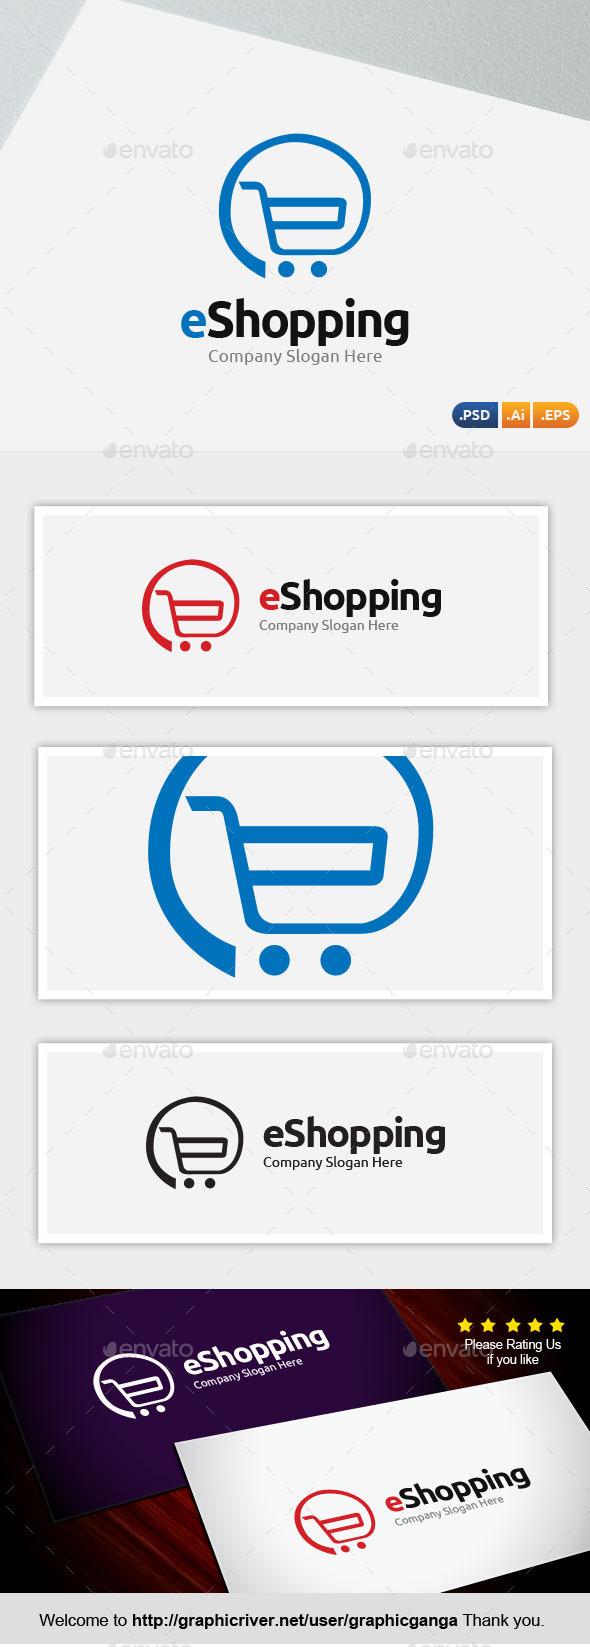 GraphicRiver eShopping 10616636